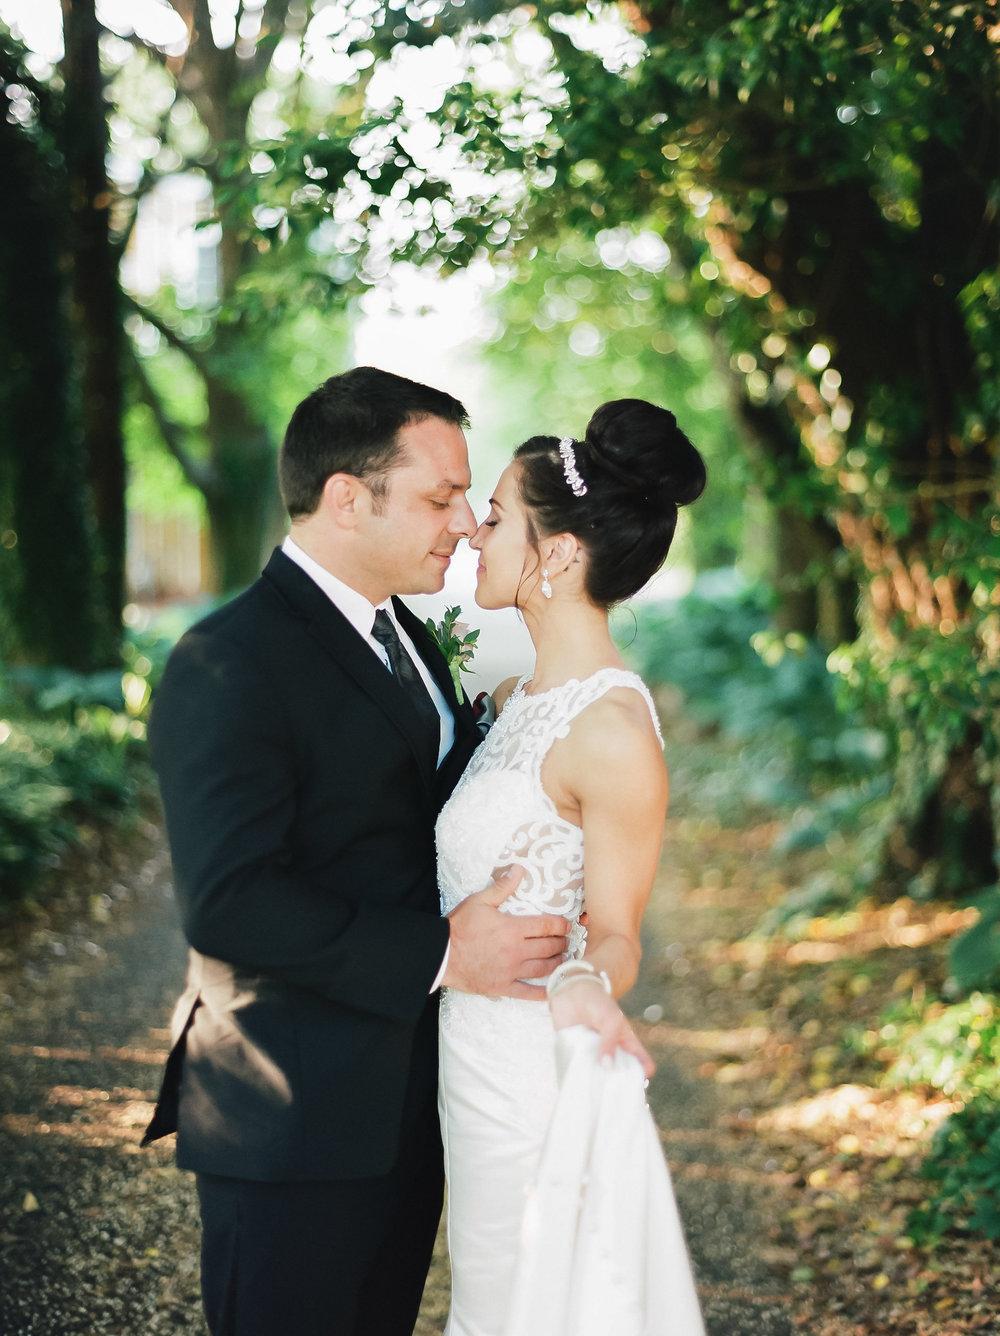 MagdalenaStudios_WeddingPhotographer_WillowCreekWinery_CarissaJoe-433.jpg